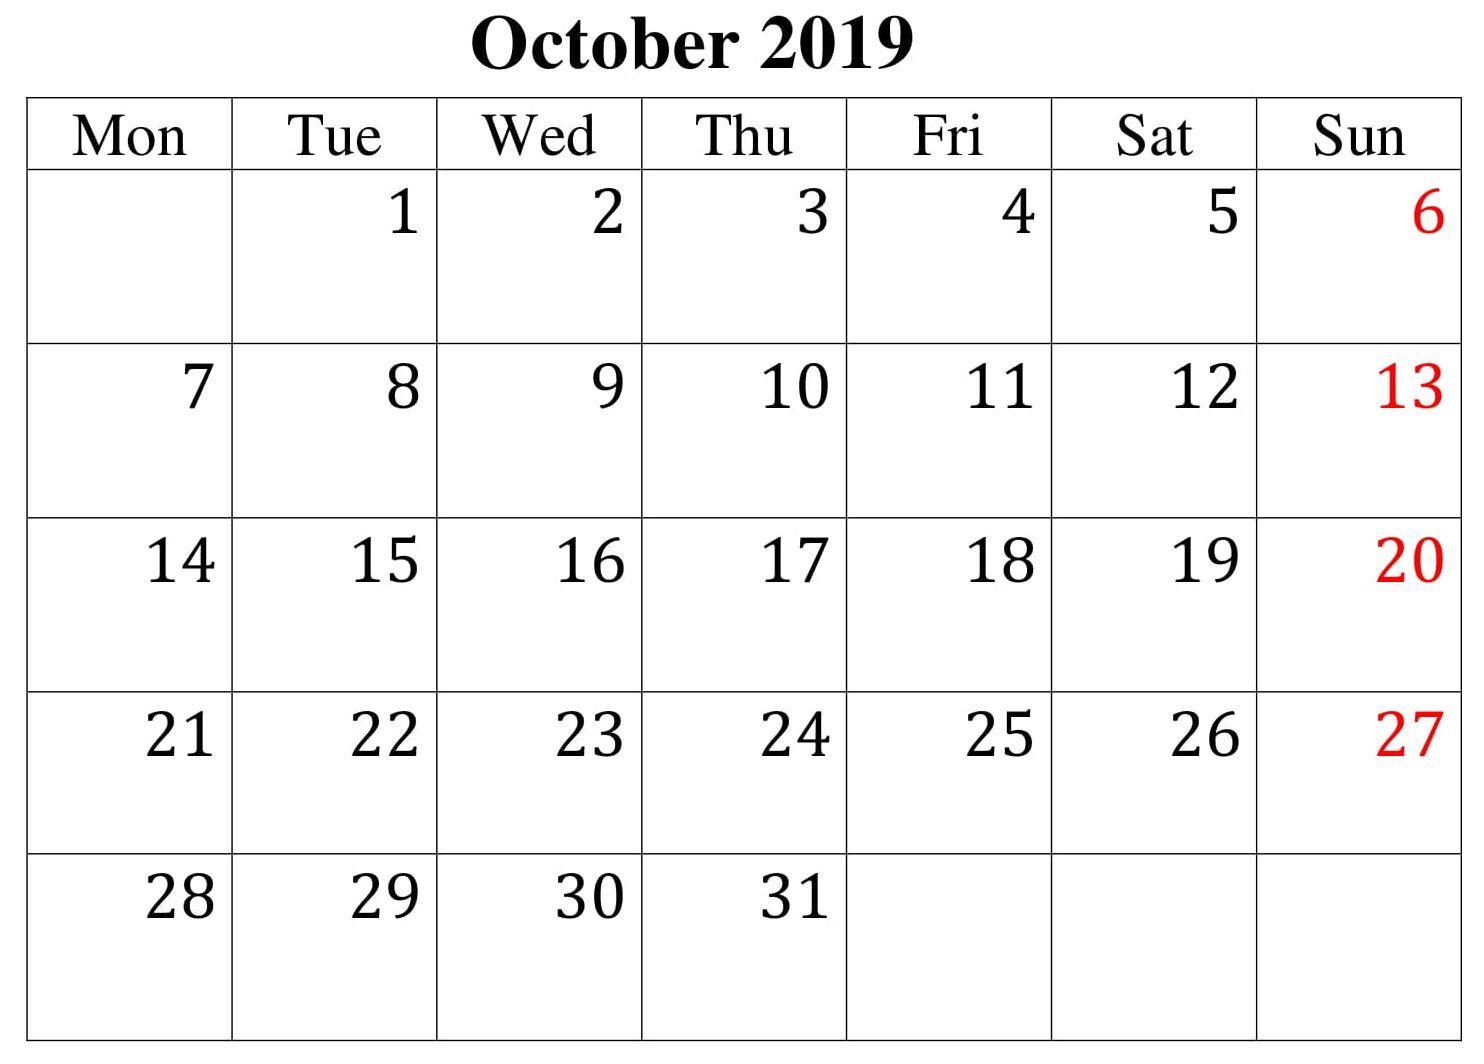 October 2019 Editable Calendar Template | Calendar Template within Waterproof Calendars Printable 2021